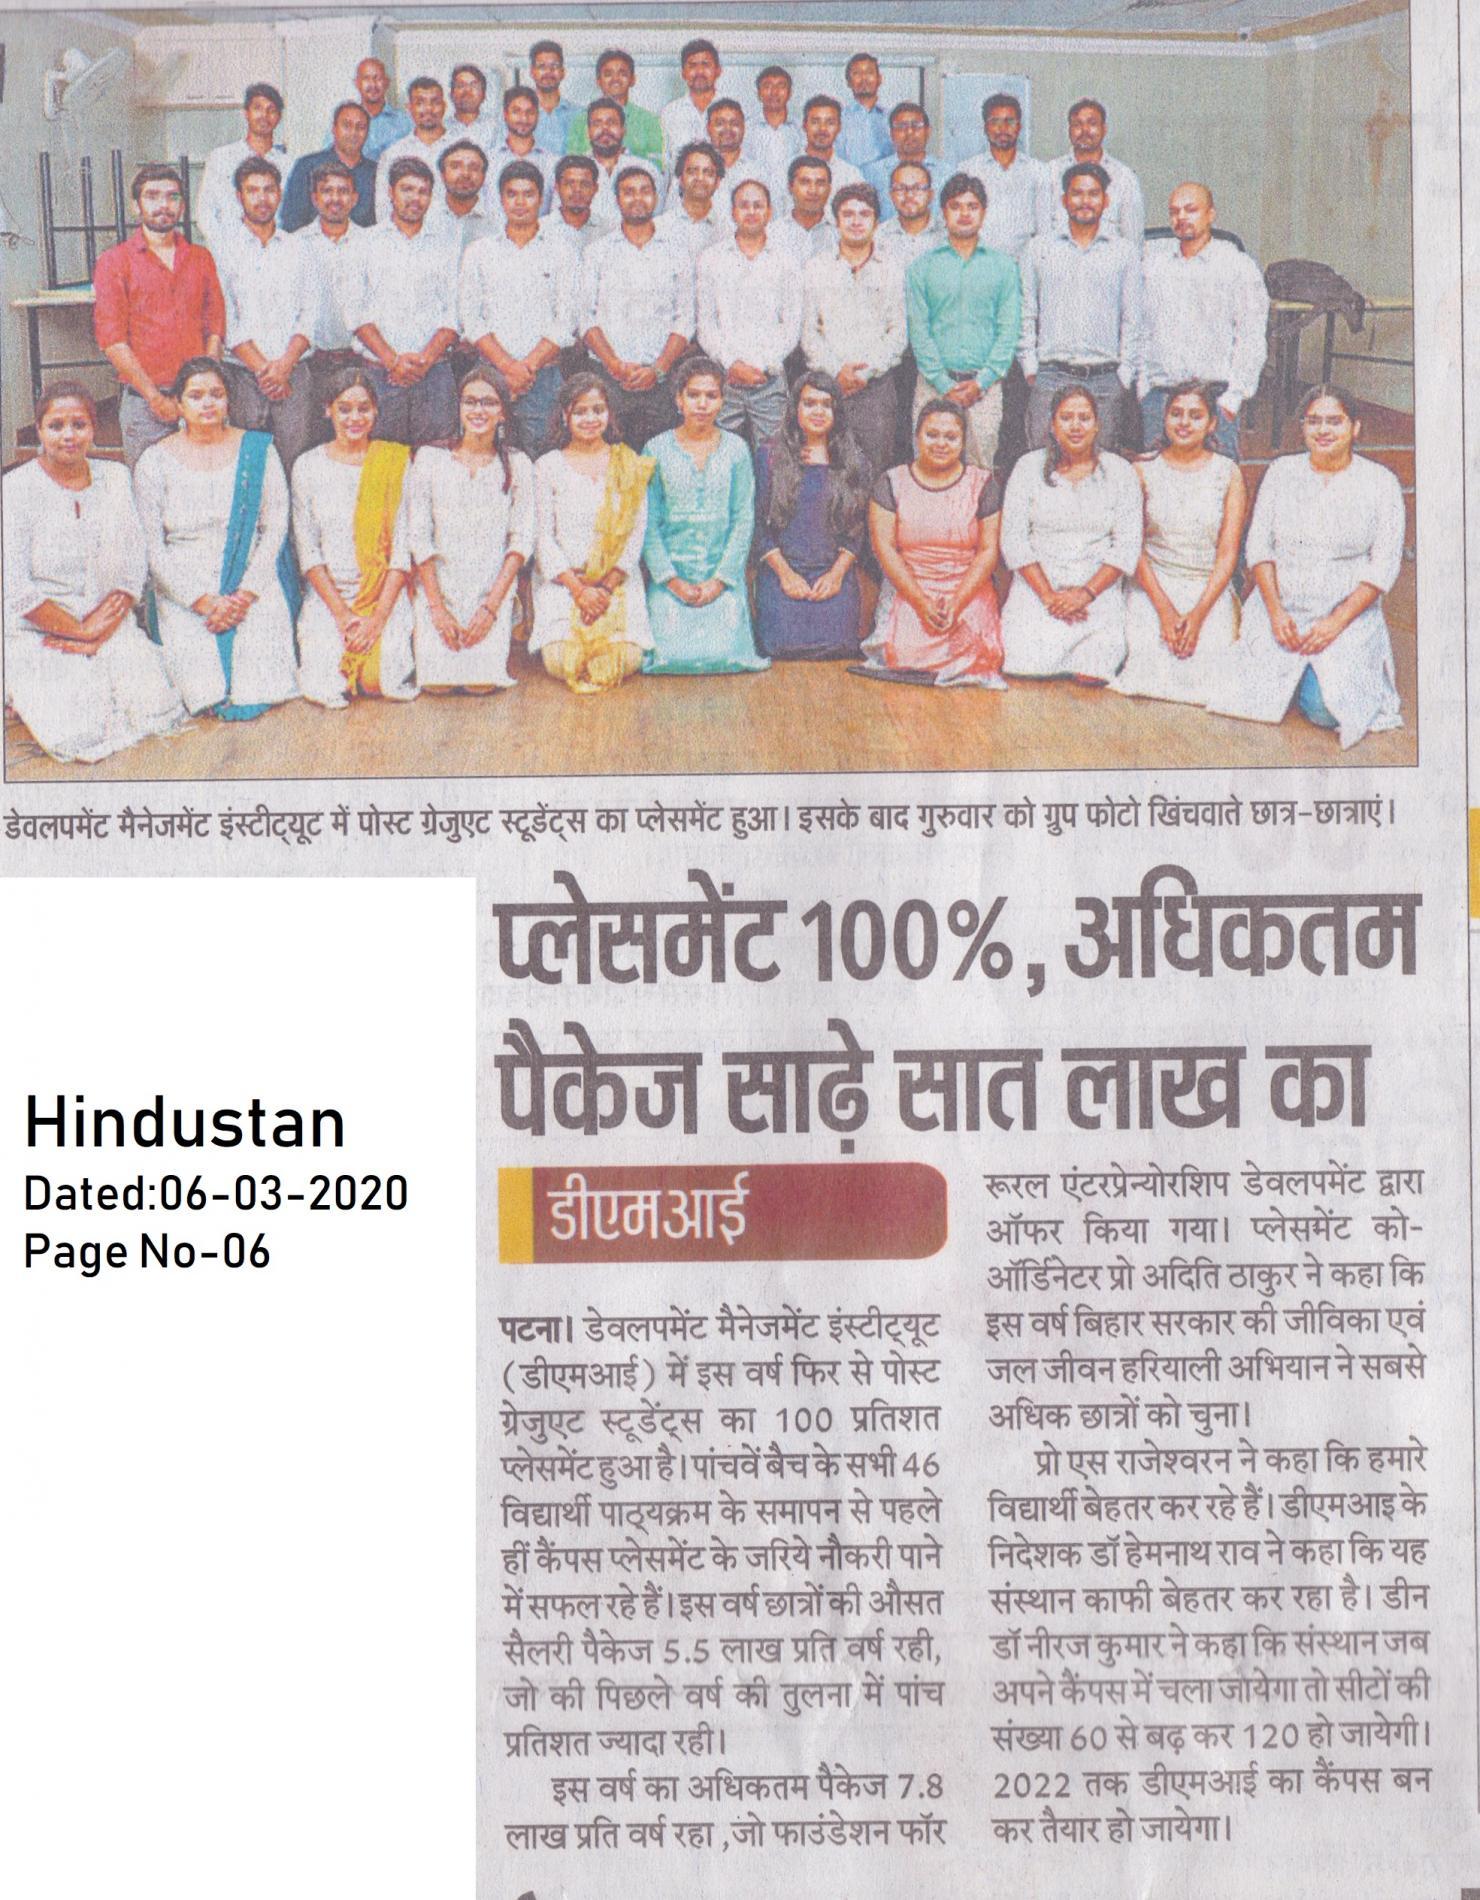 Hindustan06-03-2020